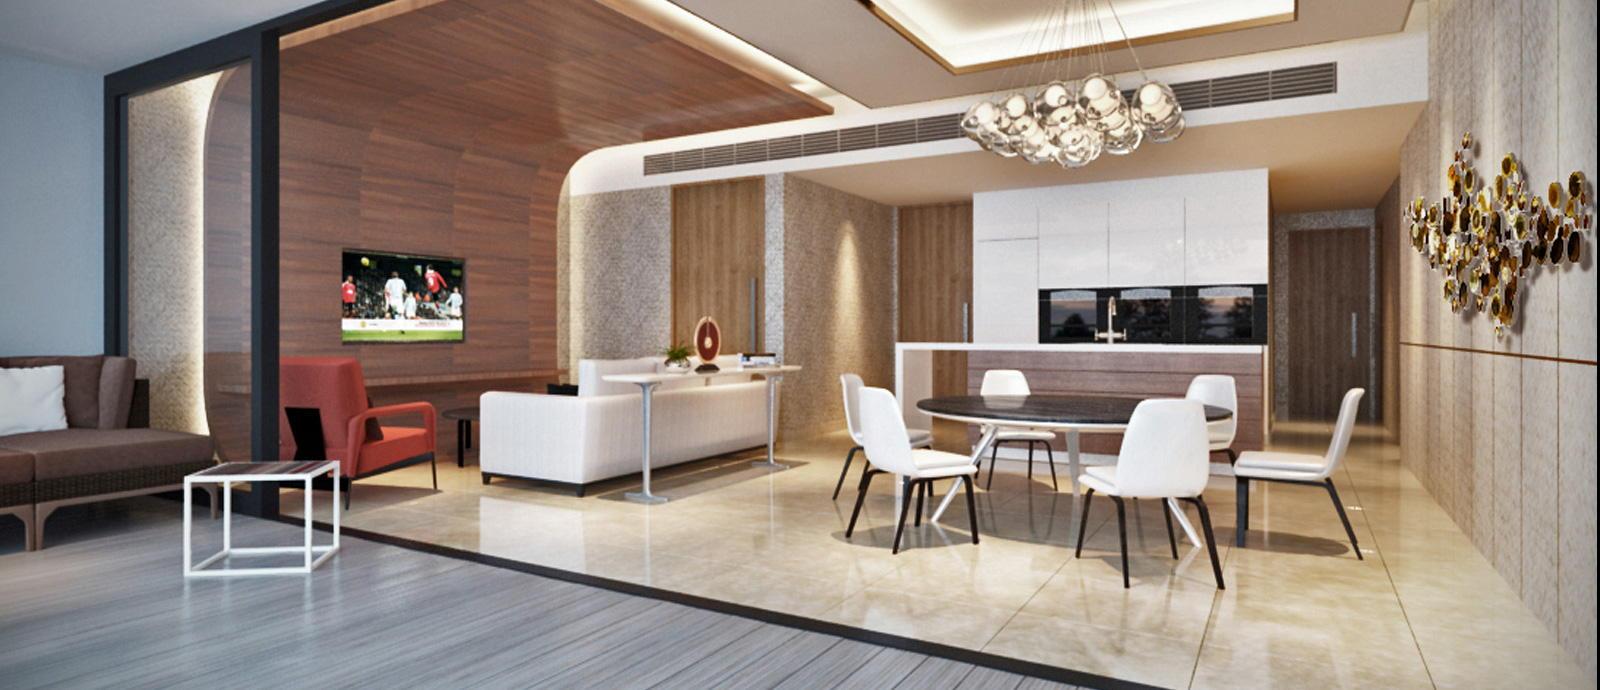 best interior design awesome singapore interior design top interior design company singapore best  interior EUPSDPG